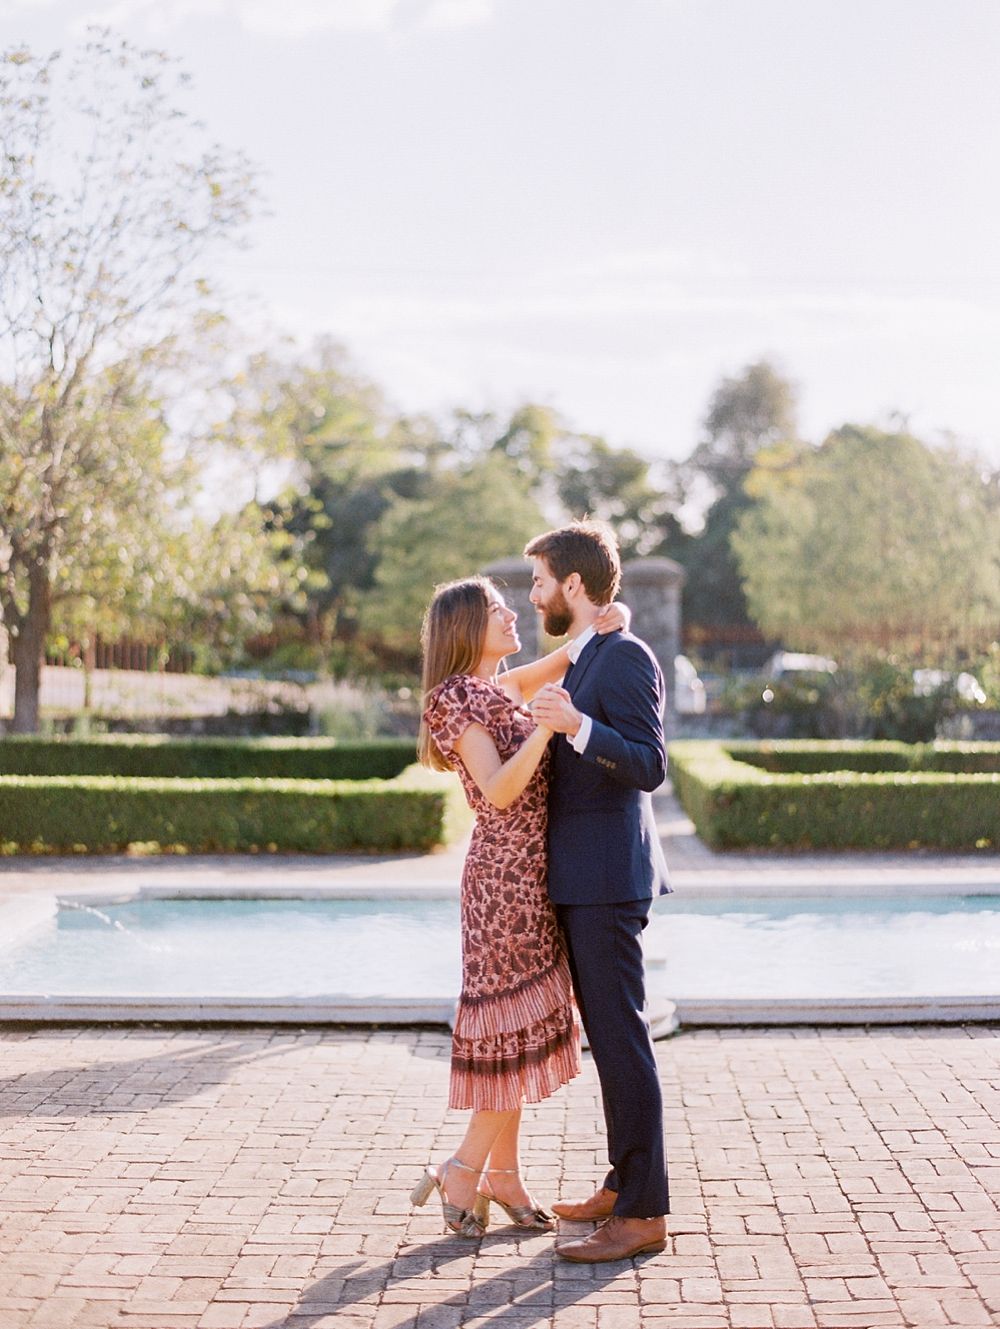 kristin-la-voie-photography-Austin-Wedding-Photographer-laguna-gloria-commodore-perry-estate-engagement-63